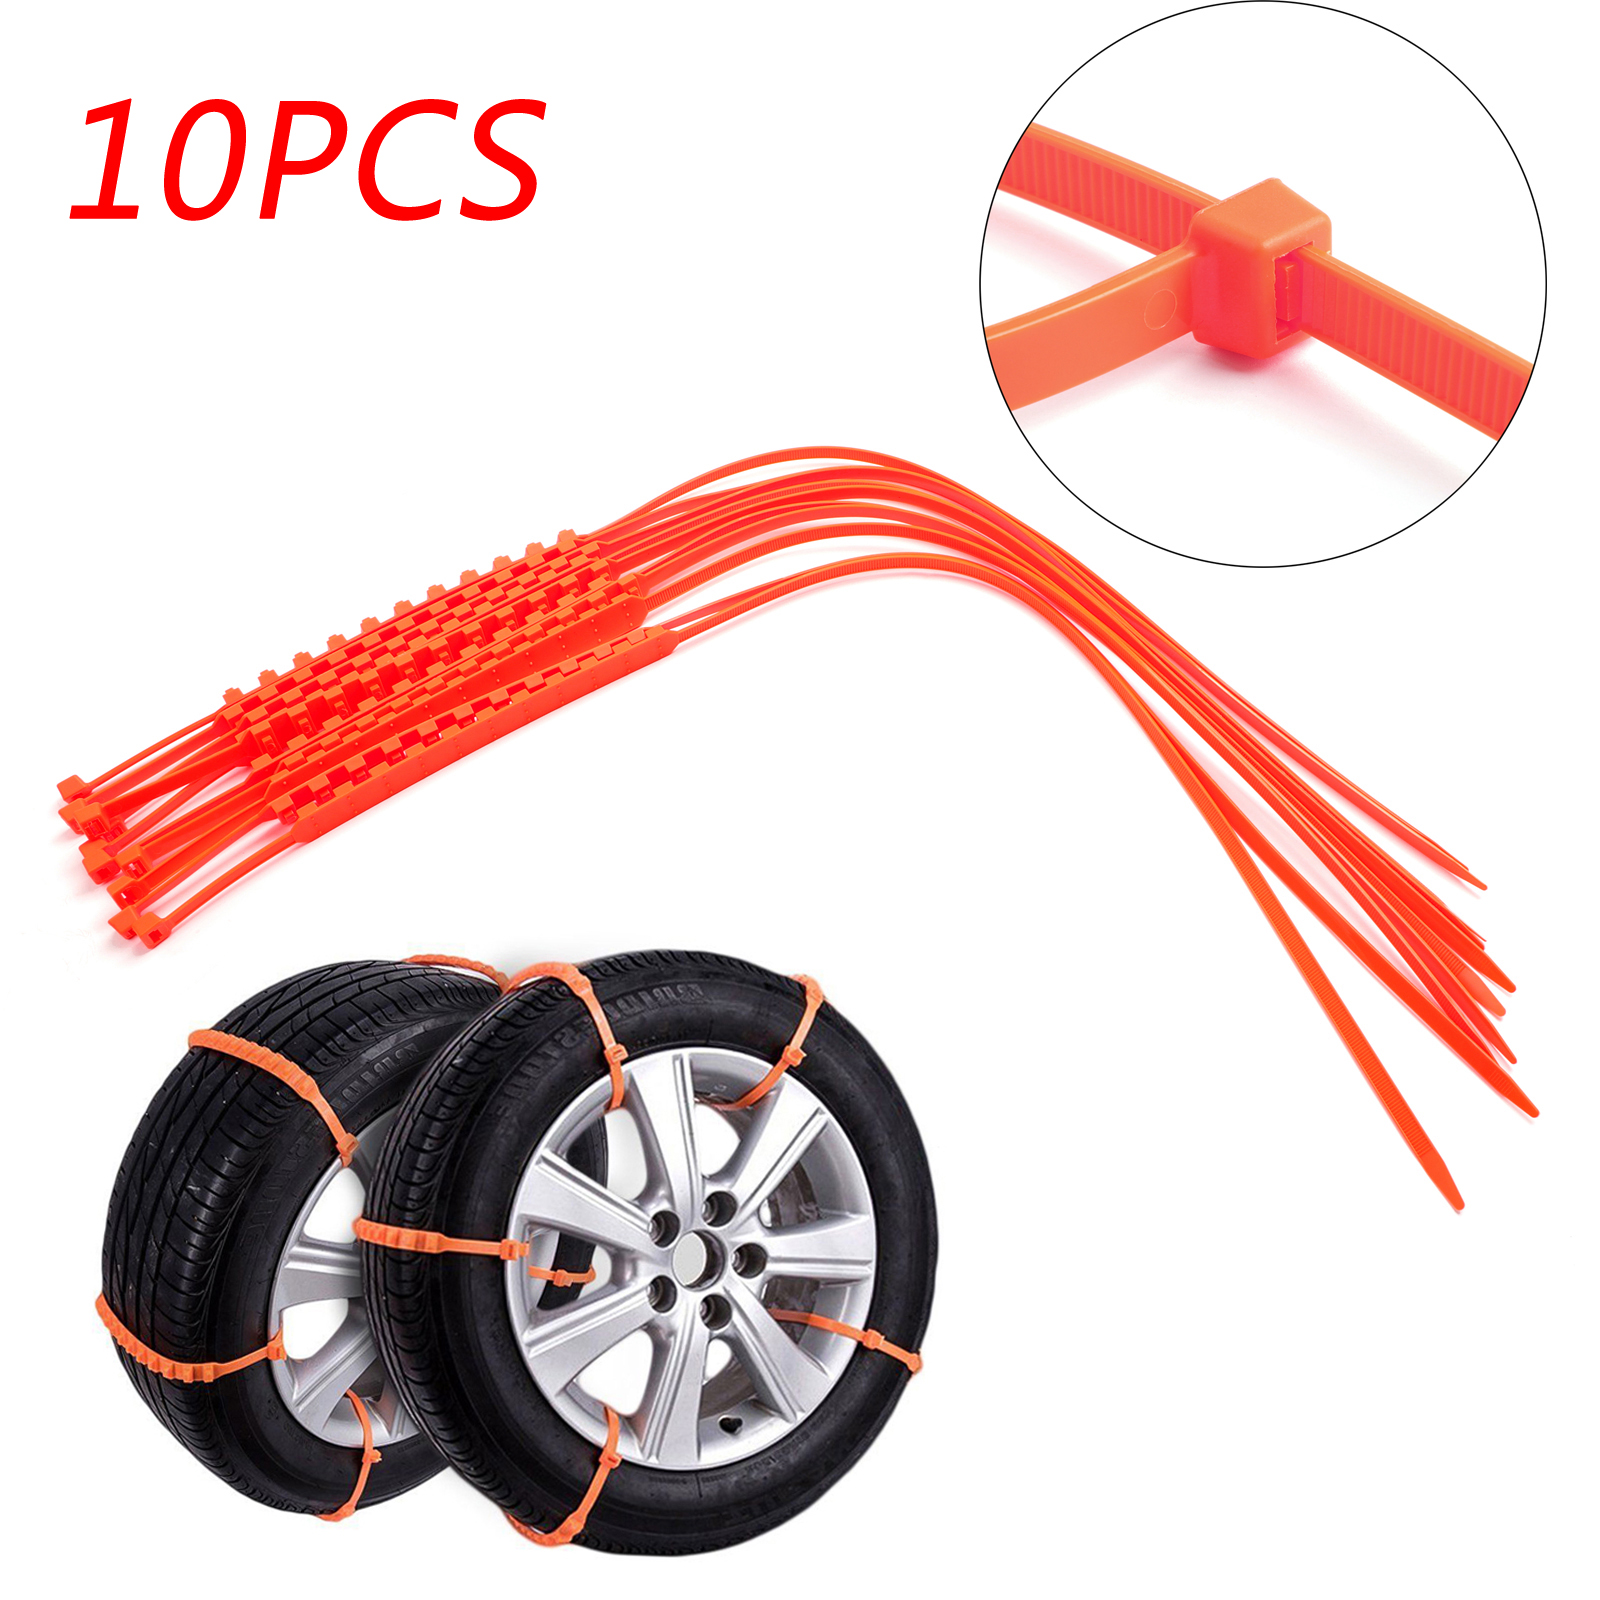 10pcs Wheel zip tie Emergency Tire Traction Aid for Snow mud Car Van Truck Chain